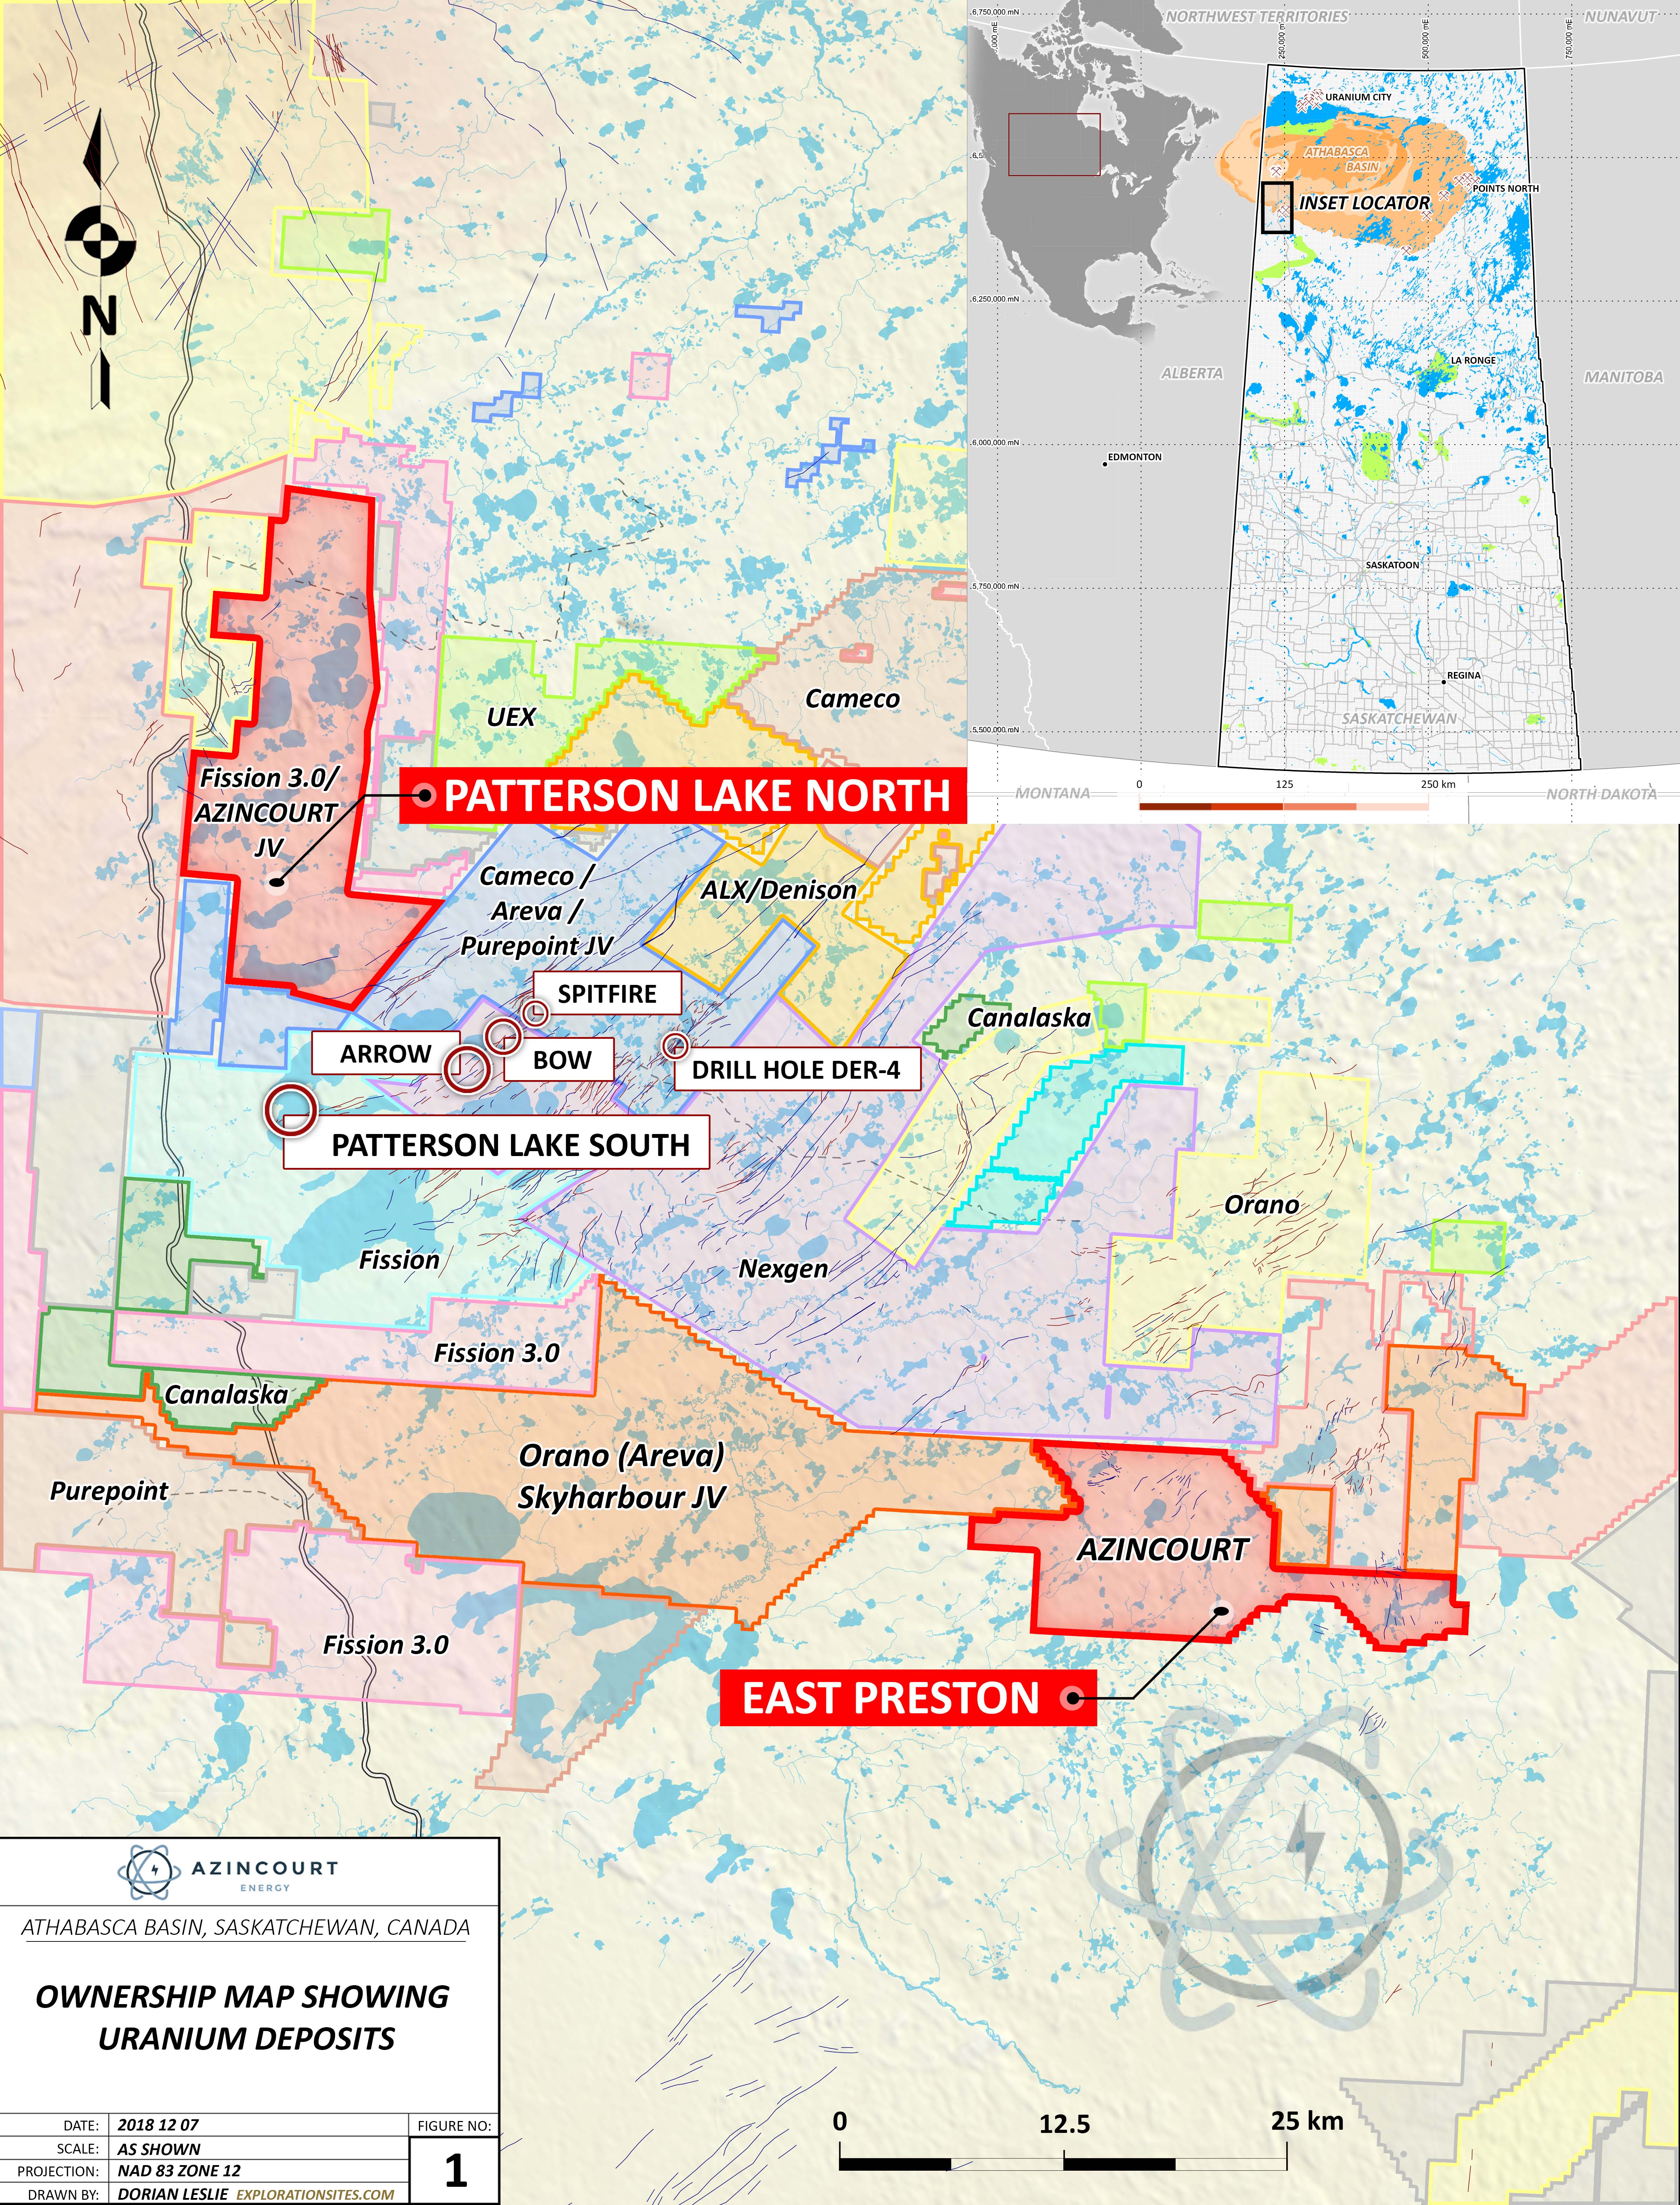 Figure 2 Project Location – Western Athabasca Basin, Saskatchewan, Canada